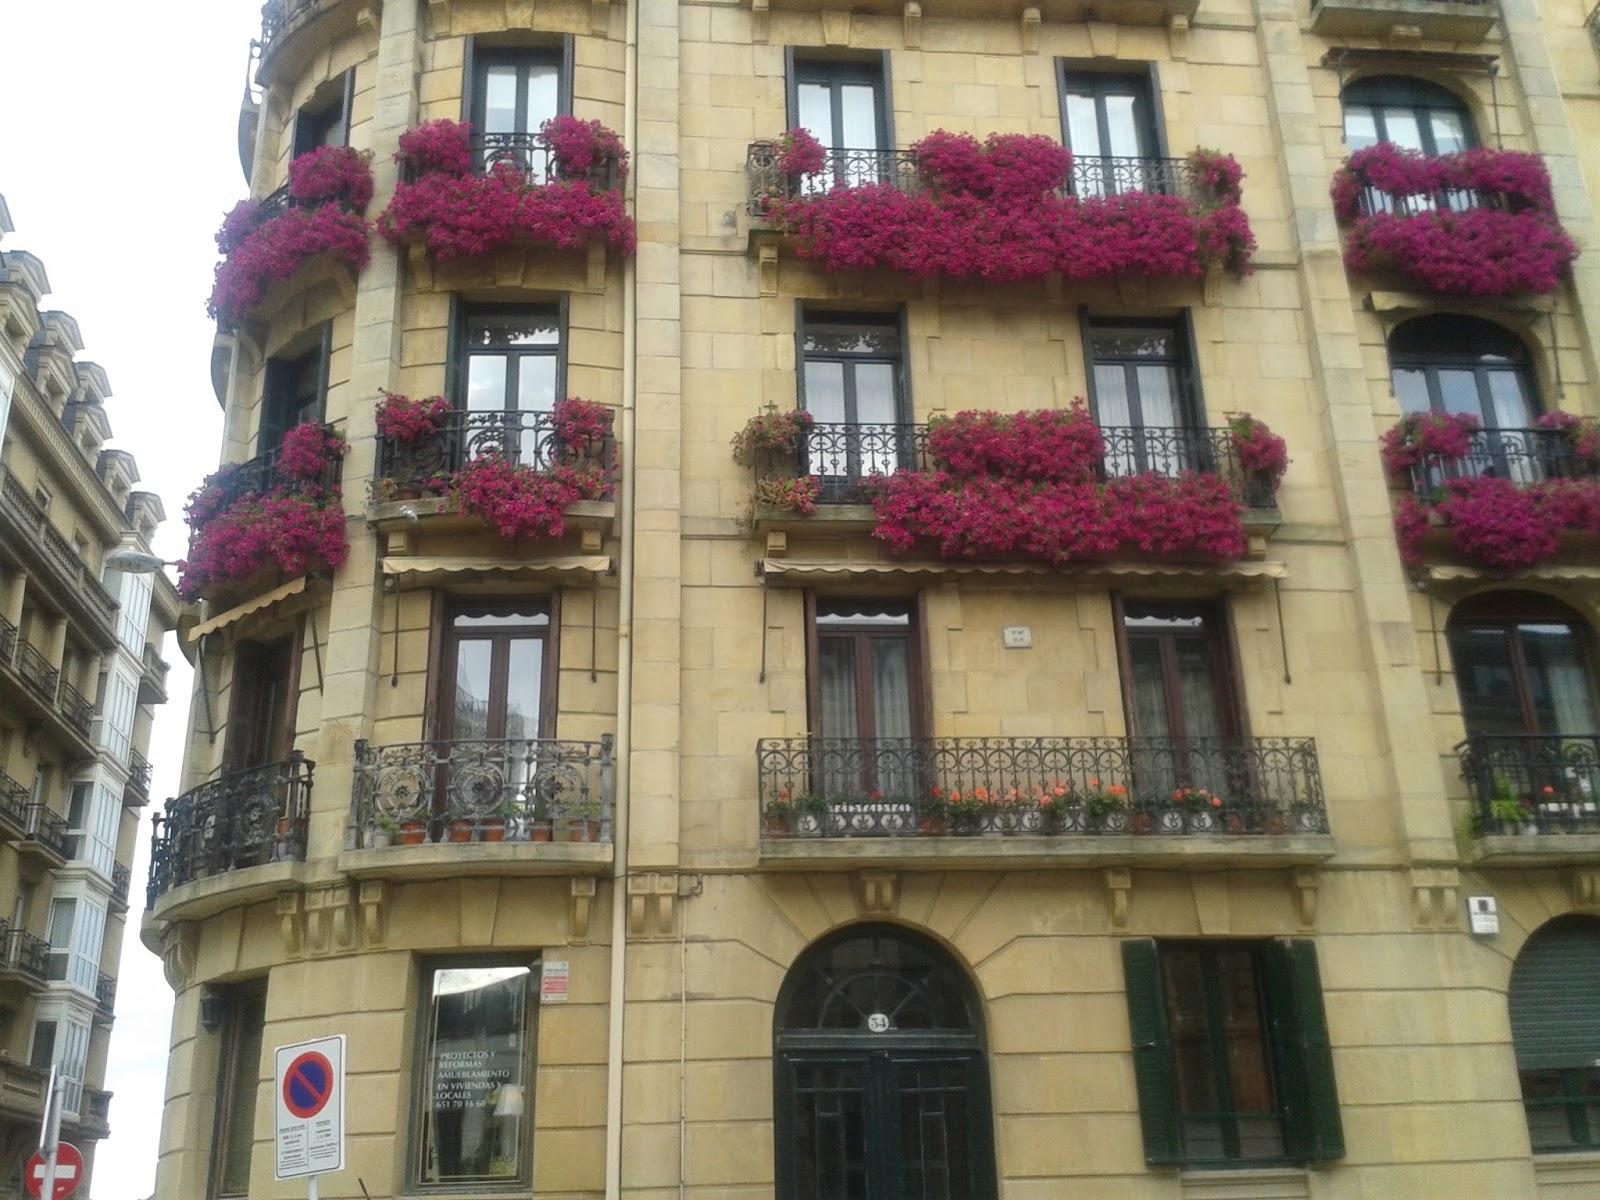 Moda Larra Balcones Con Flores En Donostia - Fotos-de-balcones-con-flores